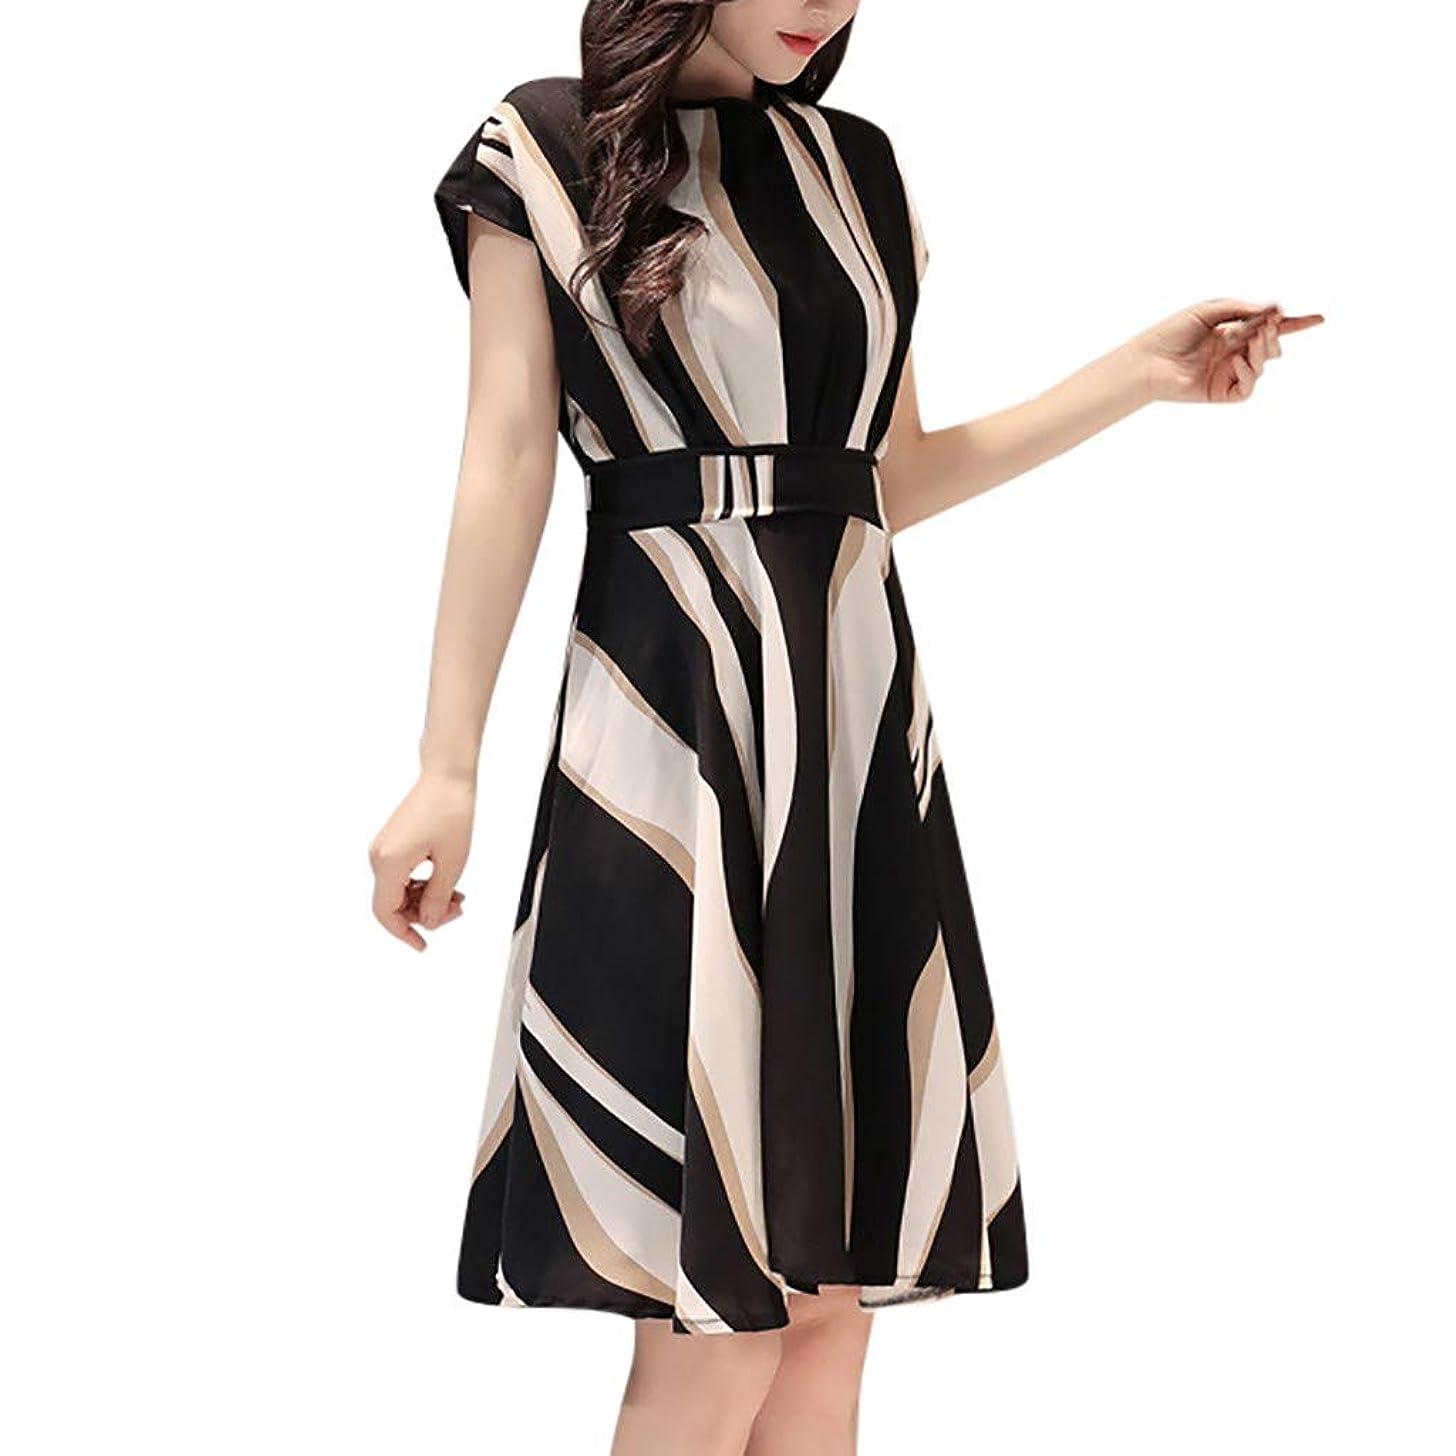 Qvwanle Fashion Women Business Dress Belt O-Neck Short Sleeve Knee Length Dress